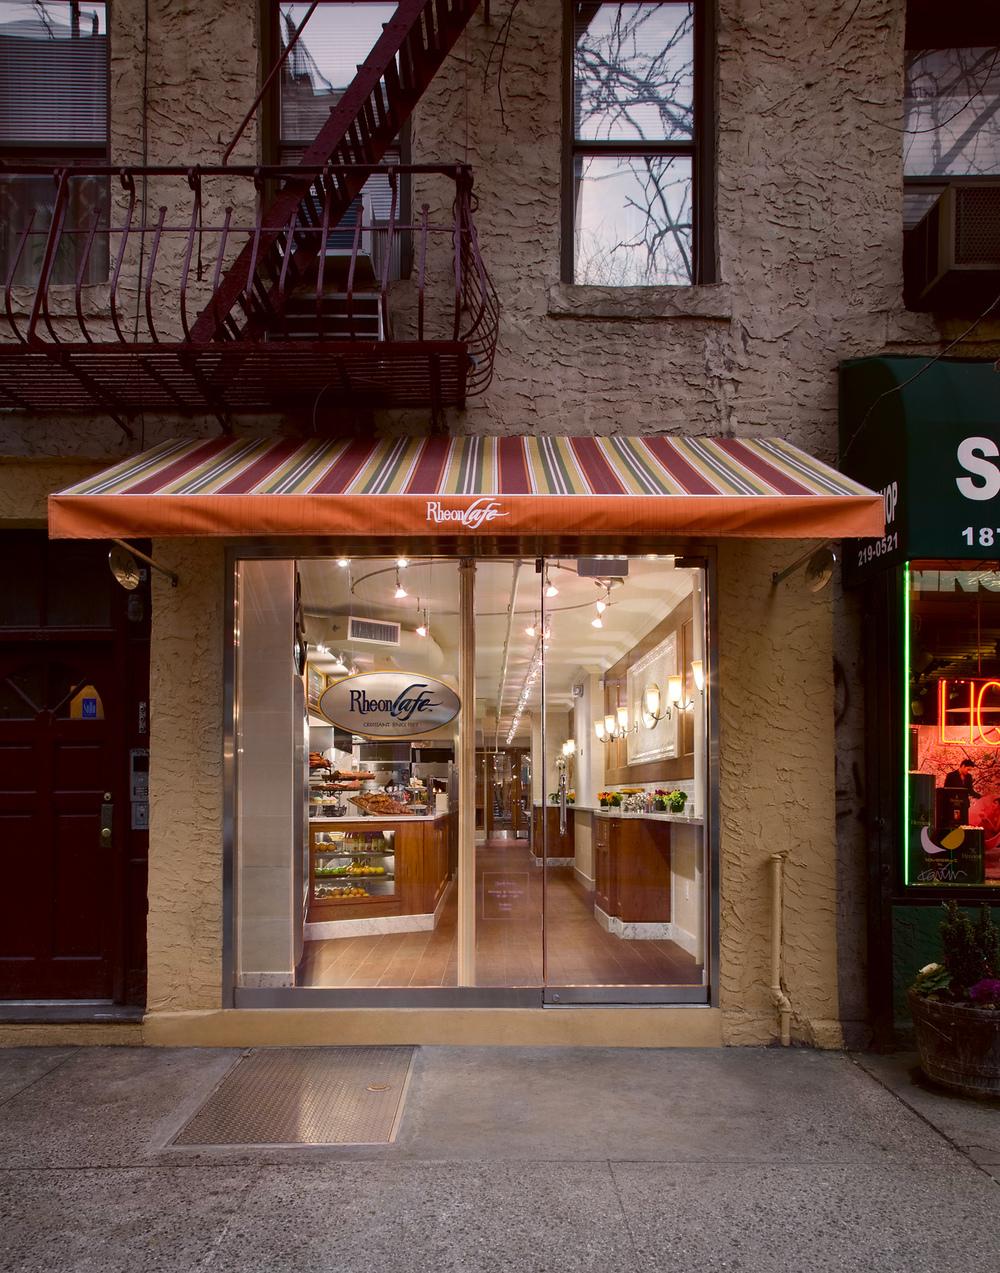 Rheon Cafe. Tobin Parnes Design. NYC. Hospitality Design. Restaurant. Cafe. Bakery. Storefront. Facade.